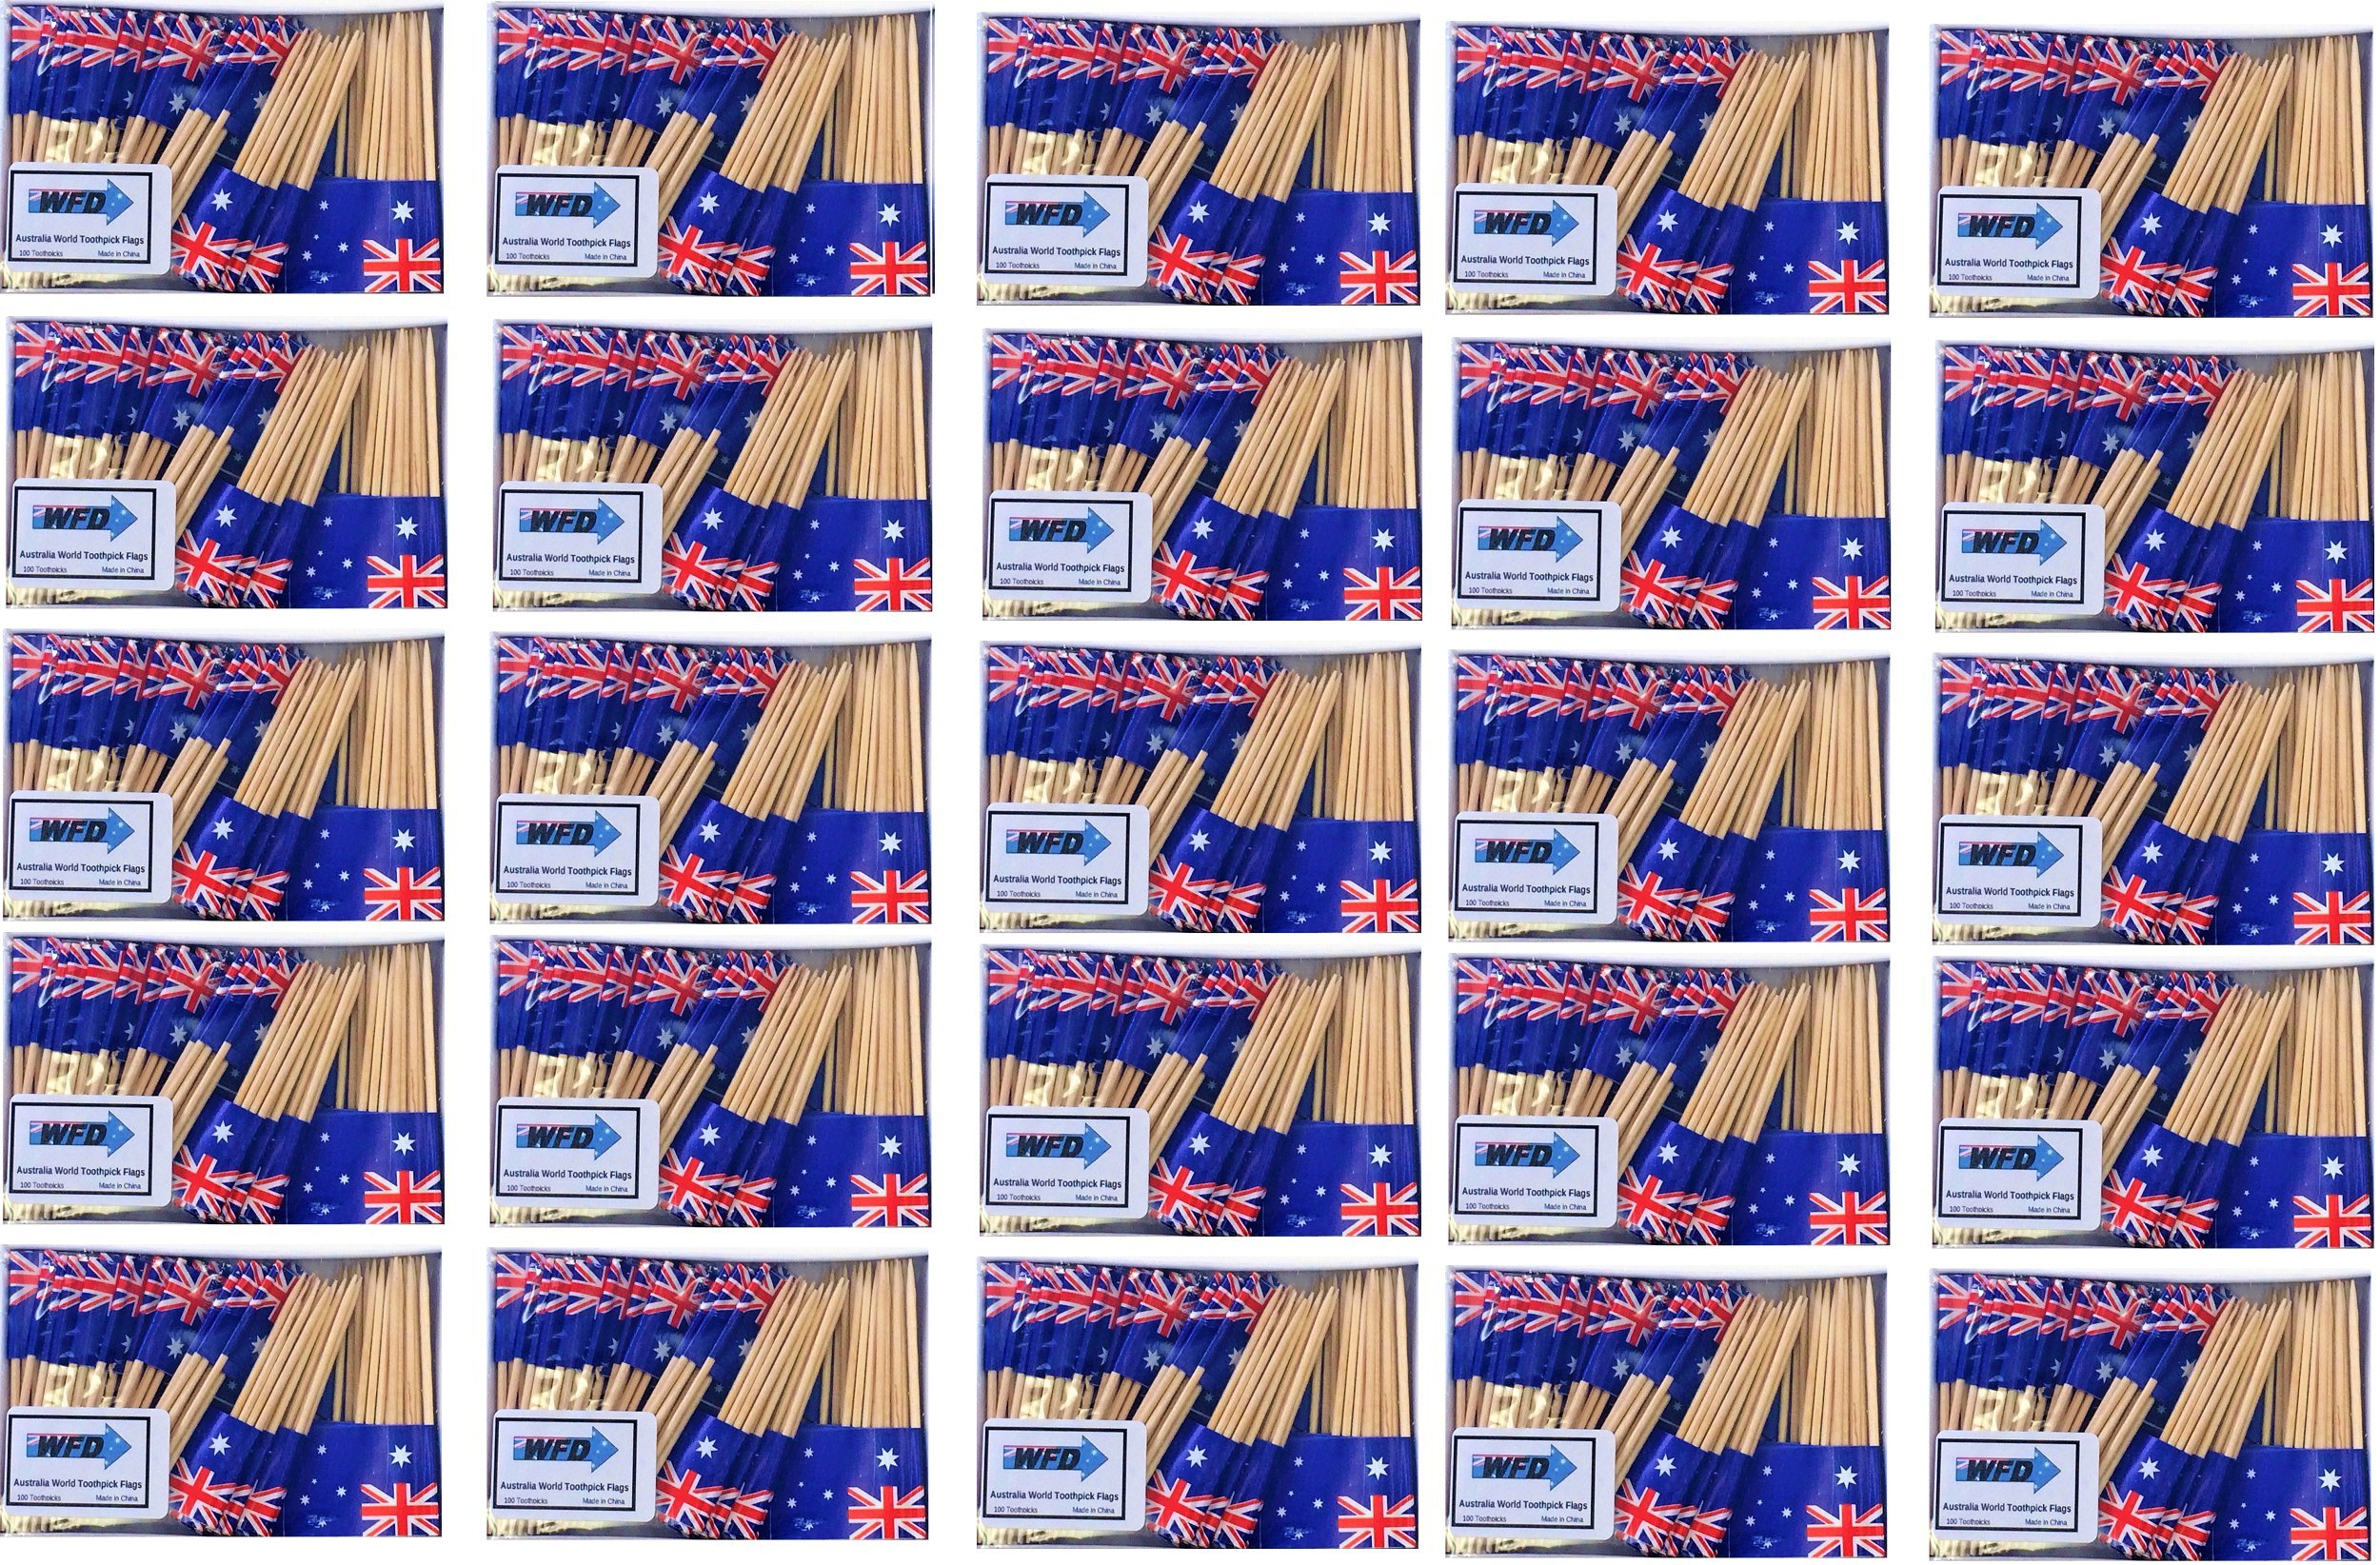 25 Box Wholesale Lot of Australia Toothpick Flags, 2500 Small Australian Flag Toothpicks or Cocktail Picks